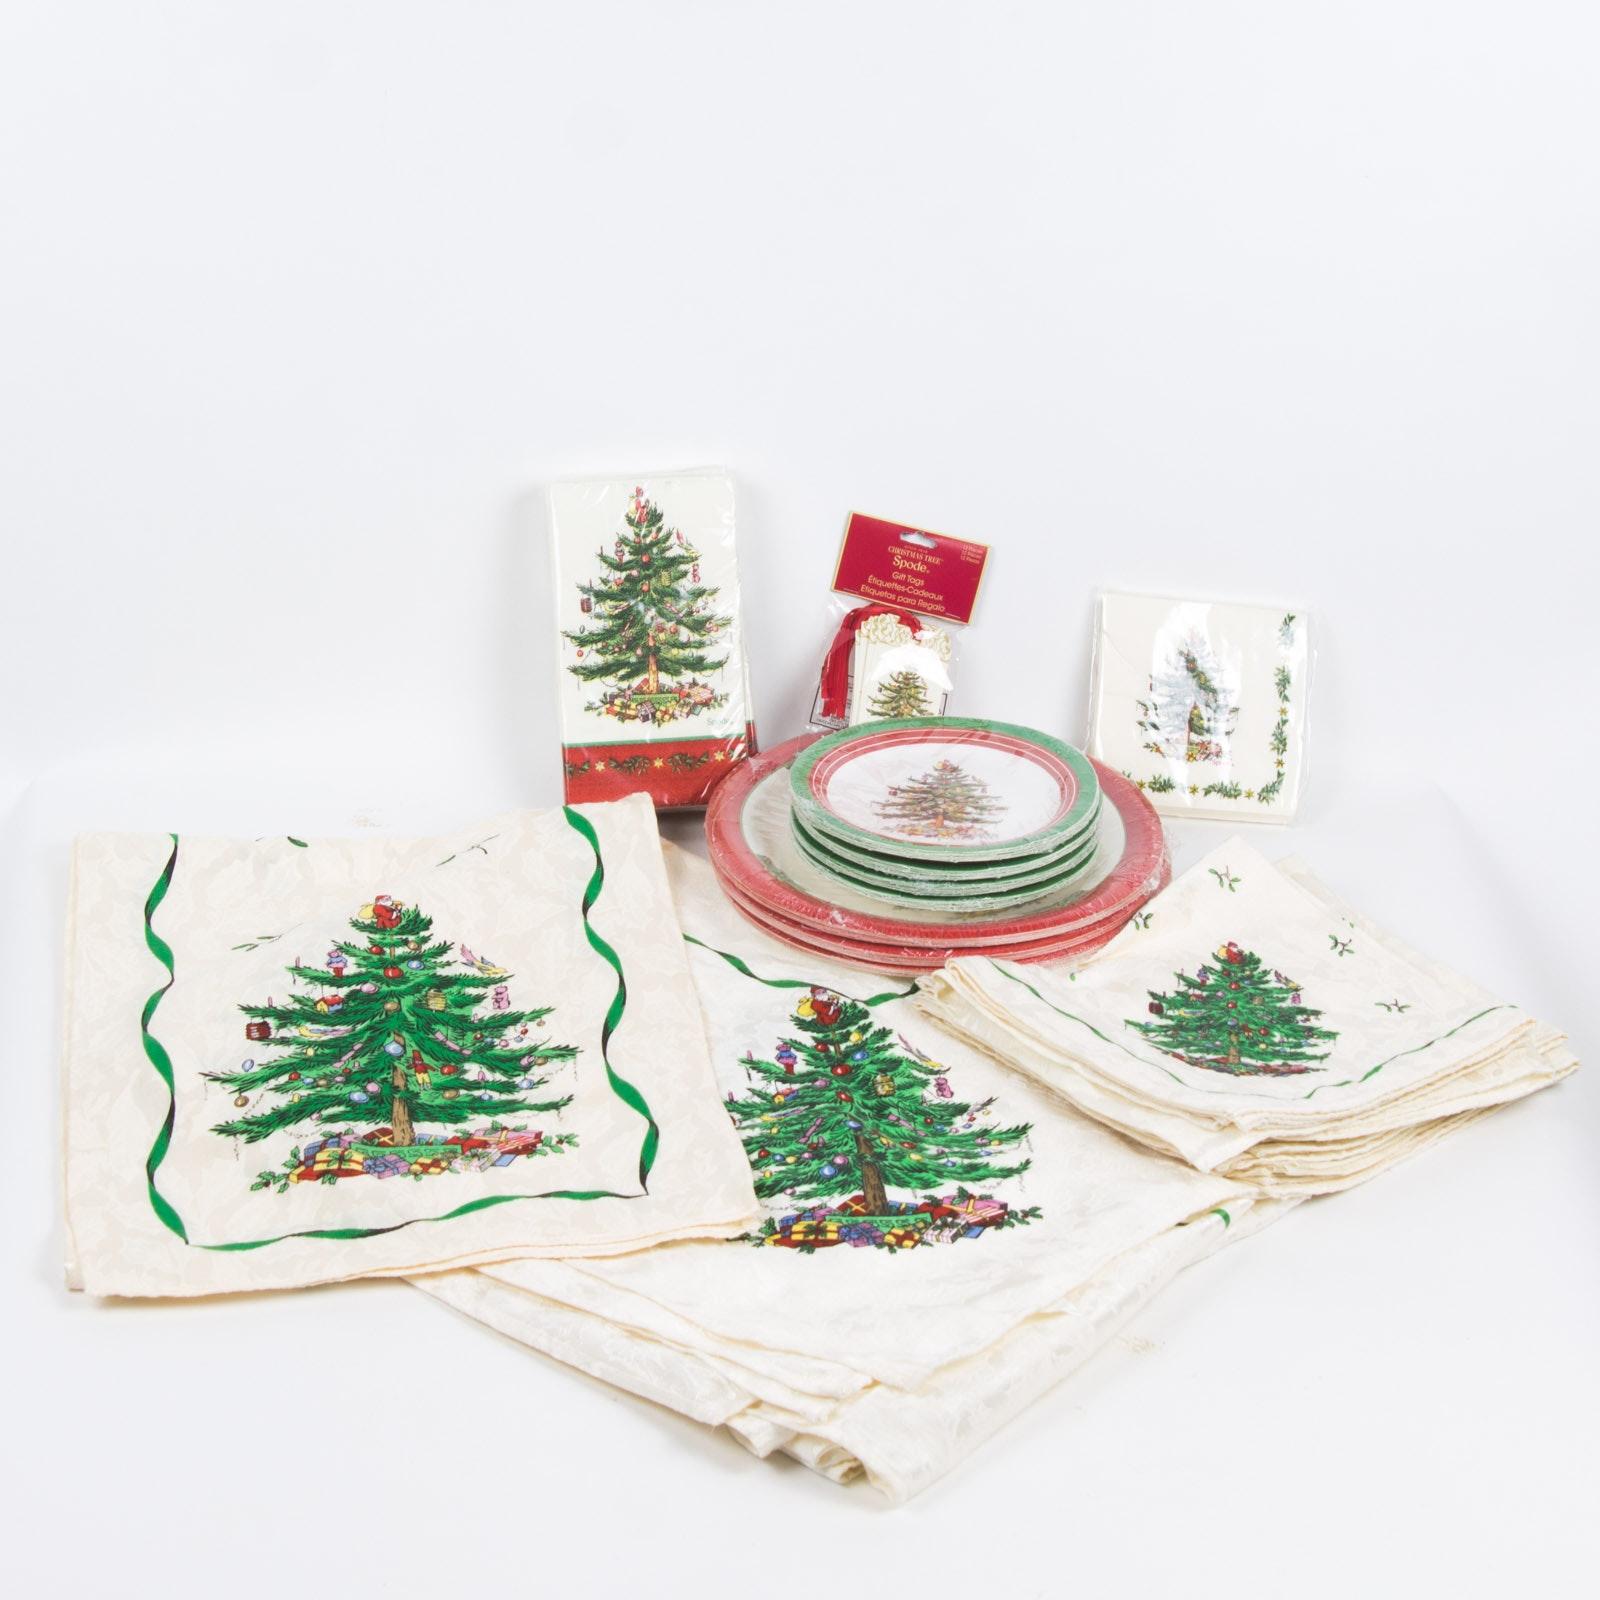 Spode Christmas Tree Table Cloths, Napkins, & Paper Plates